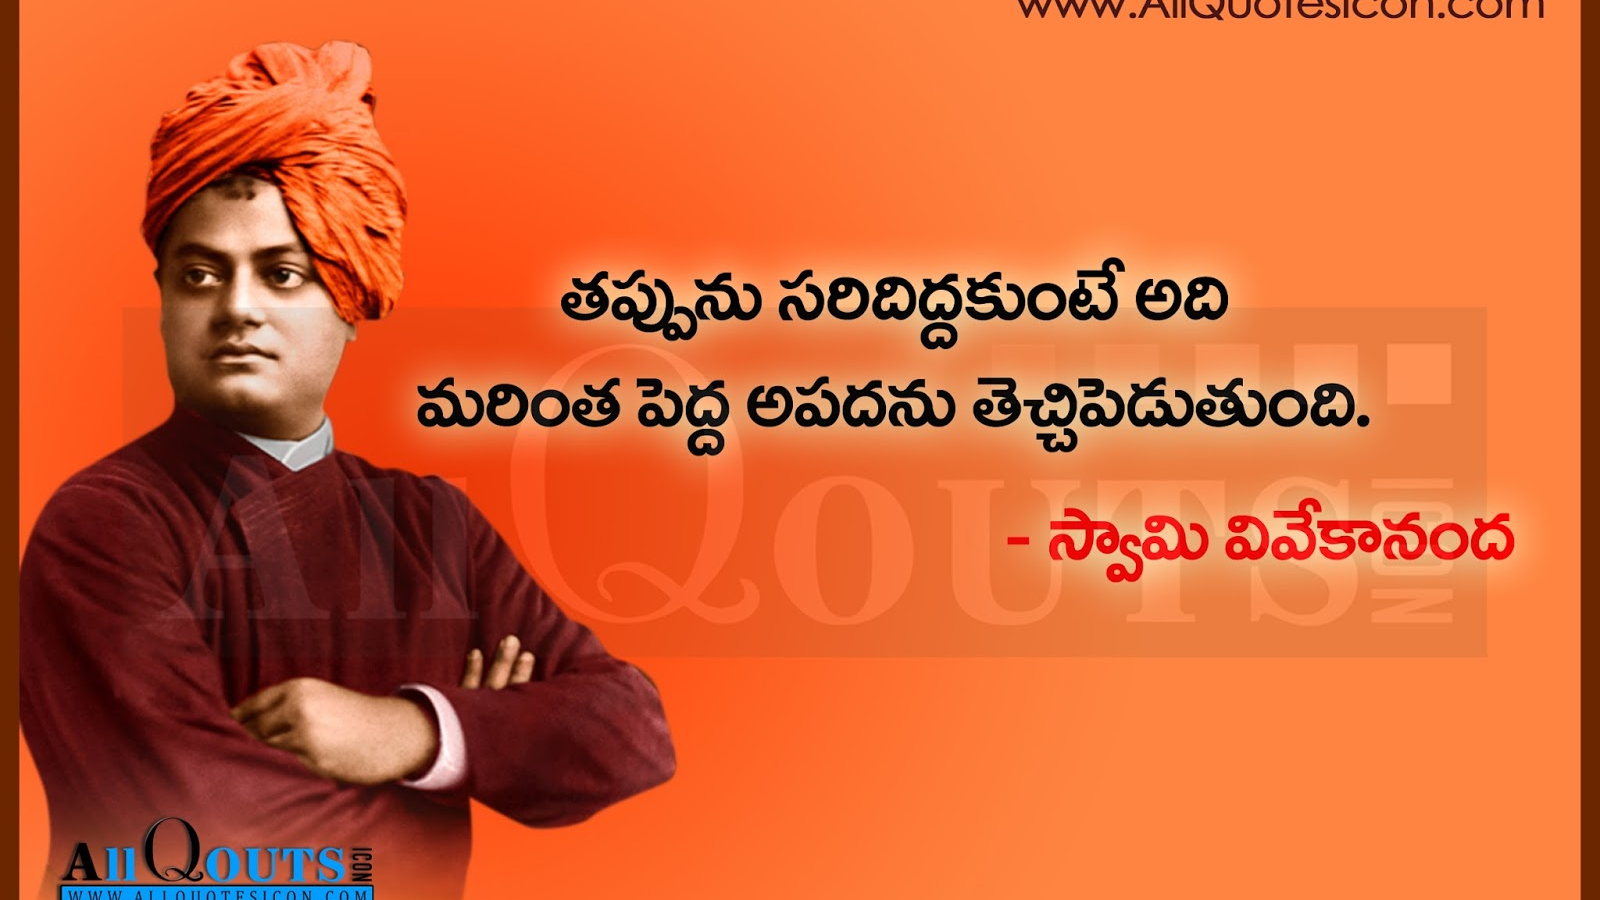 Free Download Telugu Quotation Wallpapers Swami Vivekananda